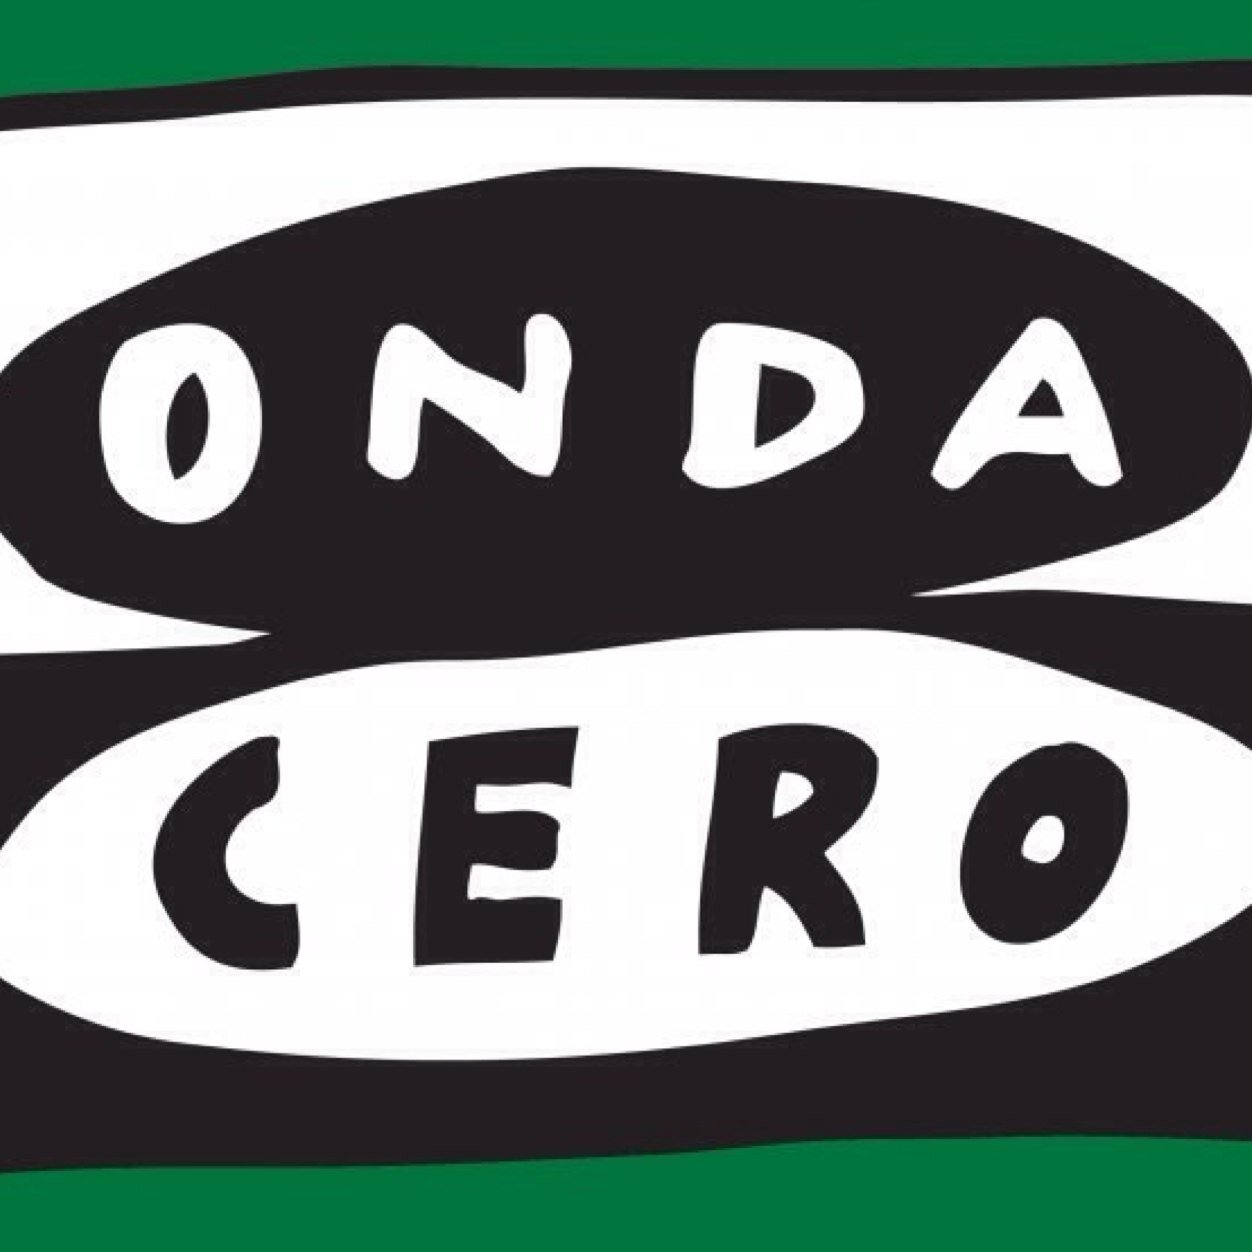 Onda Cero Huelva (@OndaCeroHuelva).